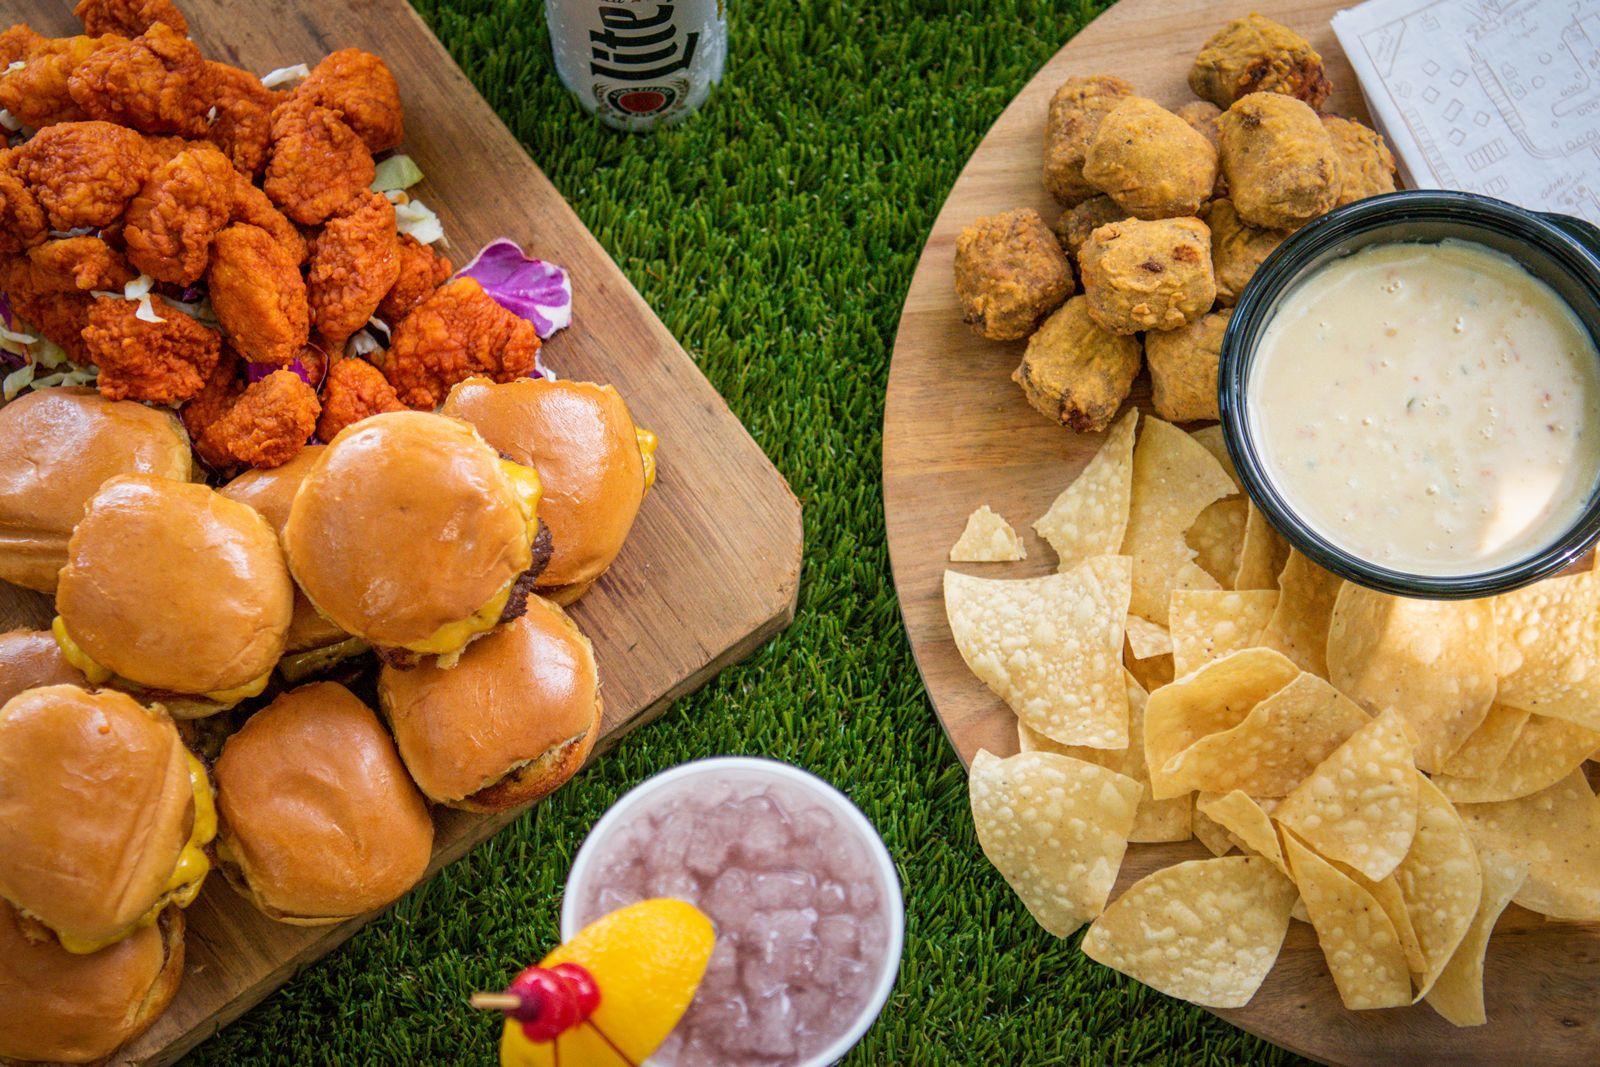 Enjoy the Taste of Louisiana this Football Season with Walk-On's Tailgate To-Geaux Bundle